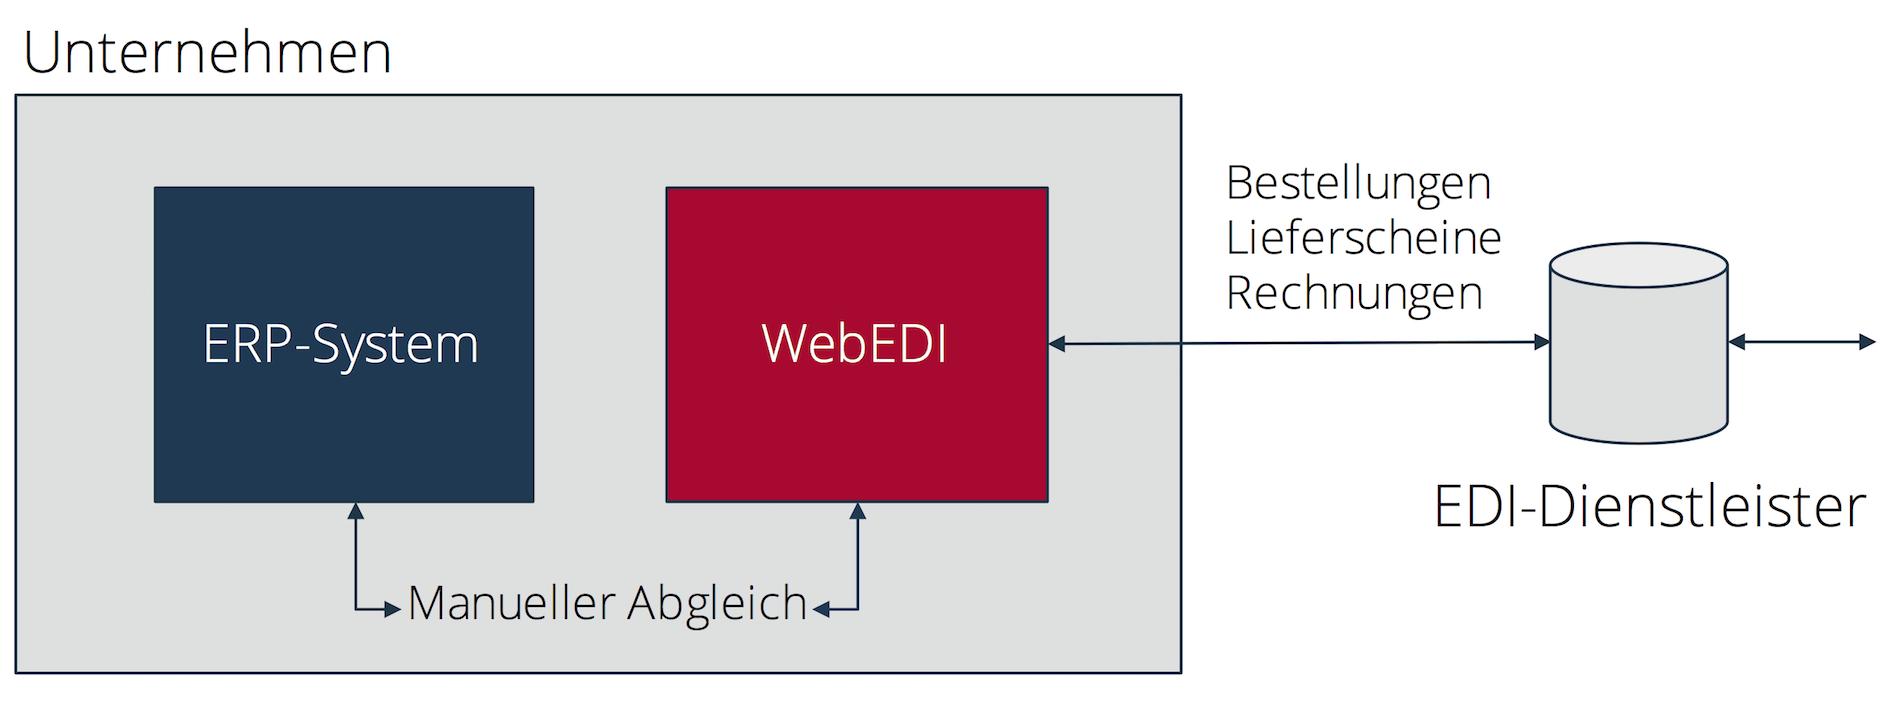 Belegübernahme bei WebEDI